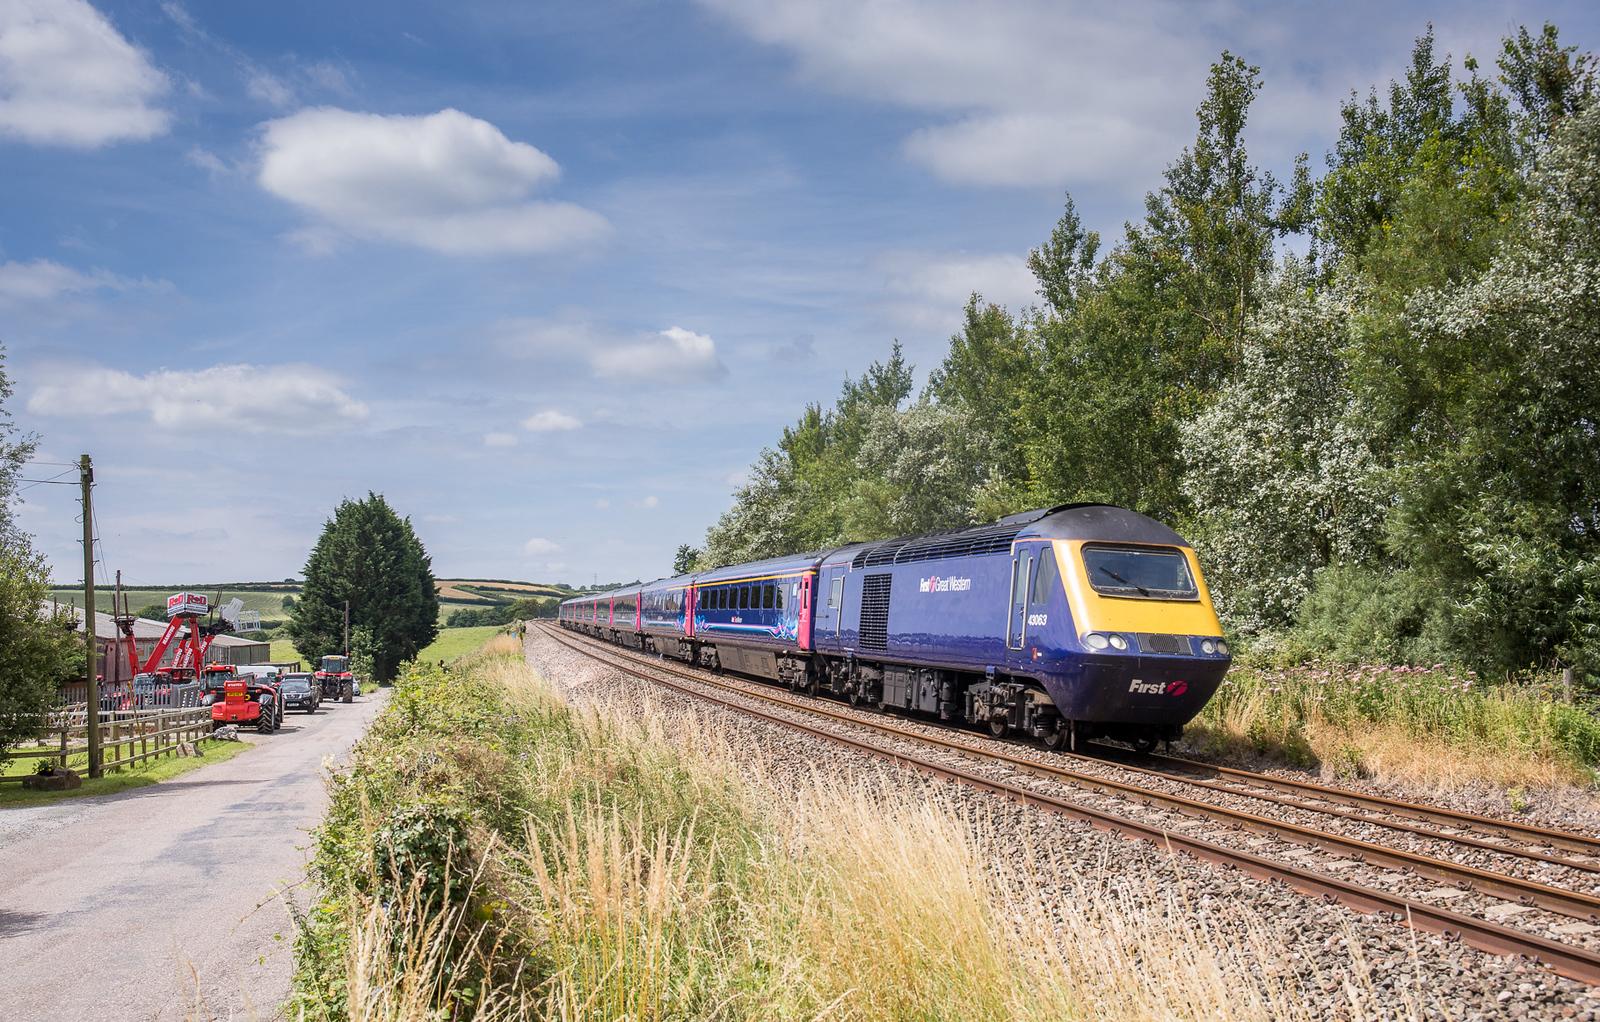 170717  43063 heads the 1A83 1000 Penzance to London Paddington  near tigley